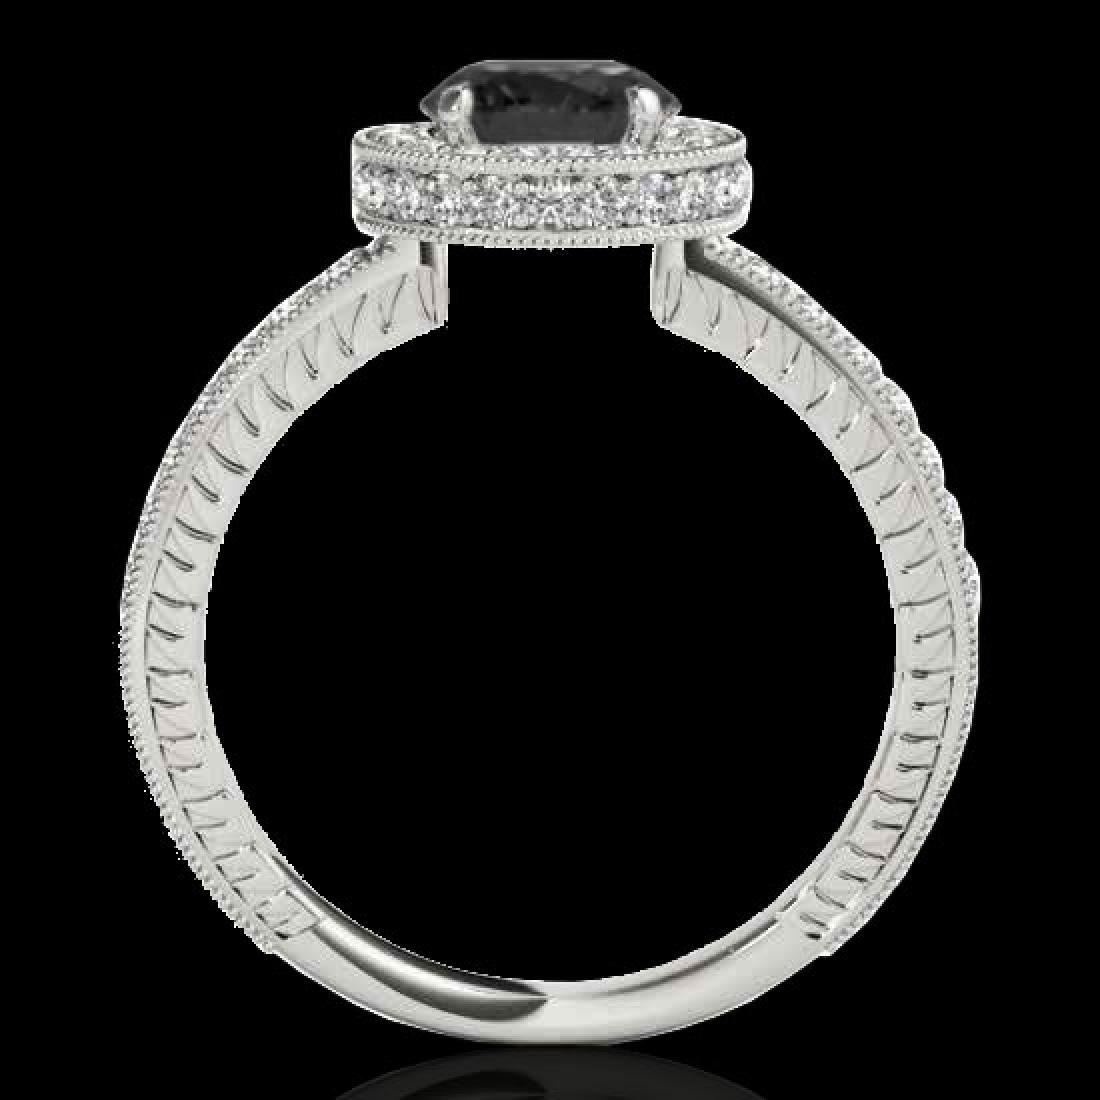 1.51 CTW Certified VS Black Diamond Solitaire Halo Ring - 2